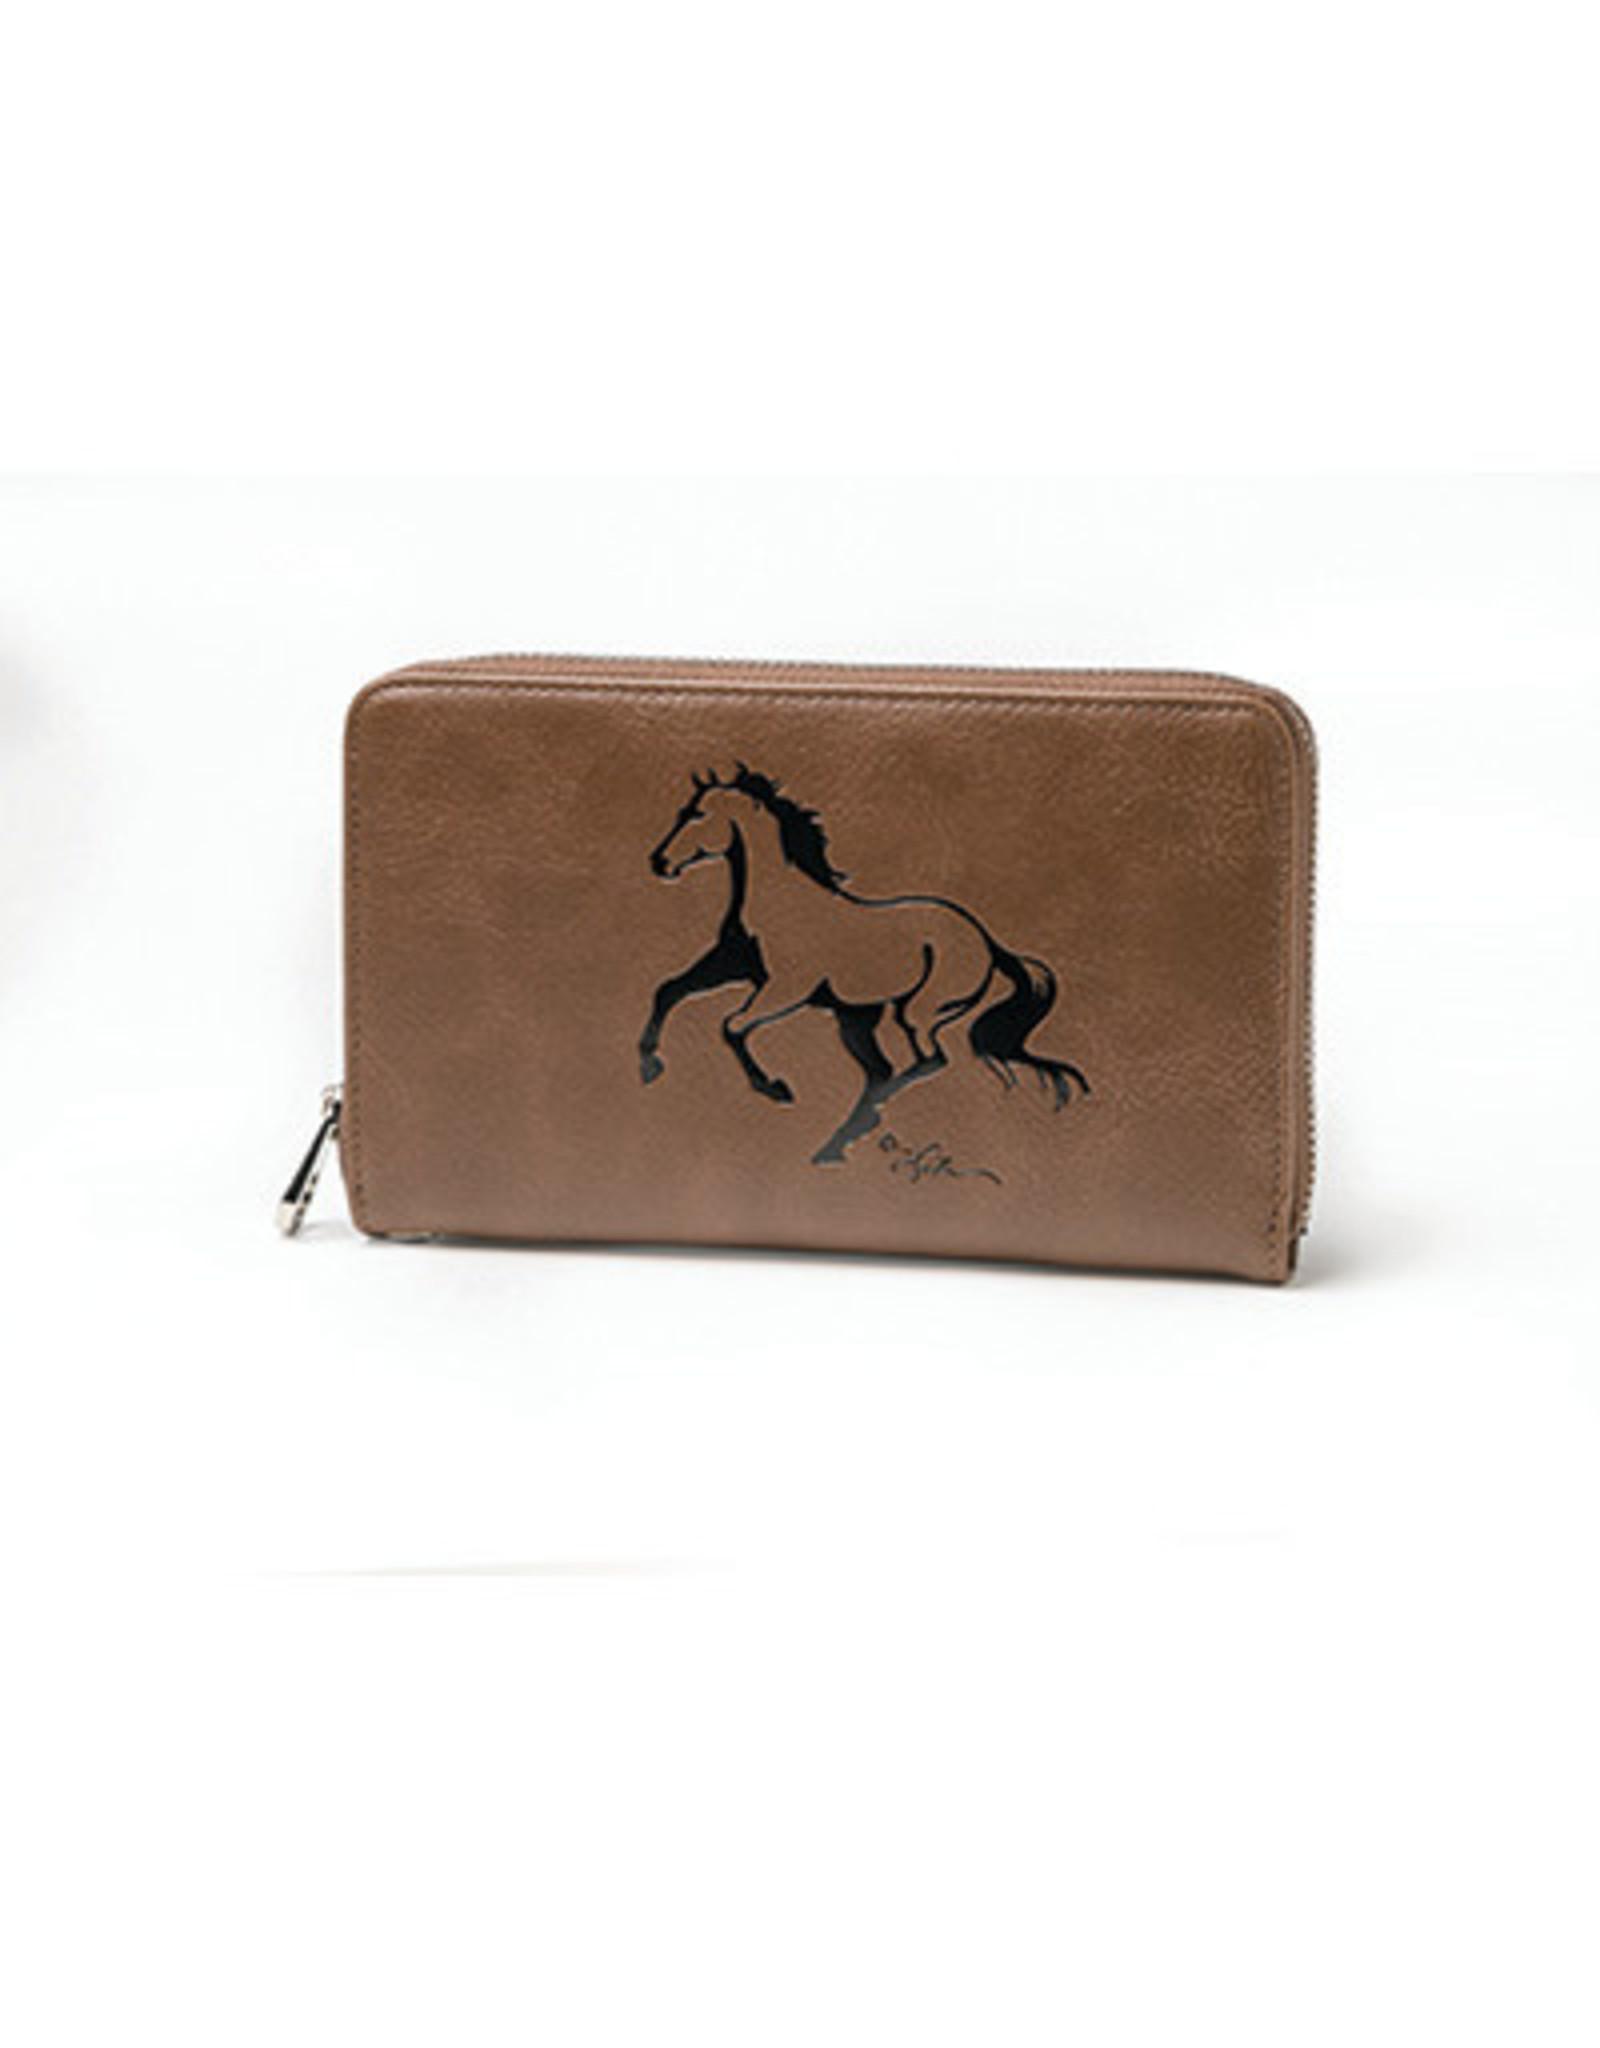 Galloping Horse Wallet